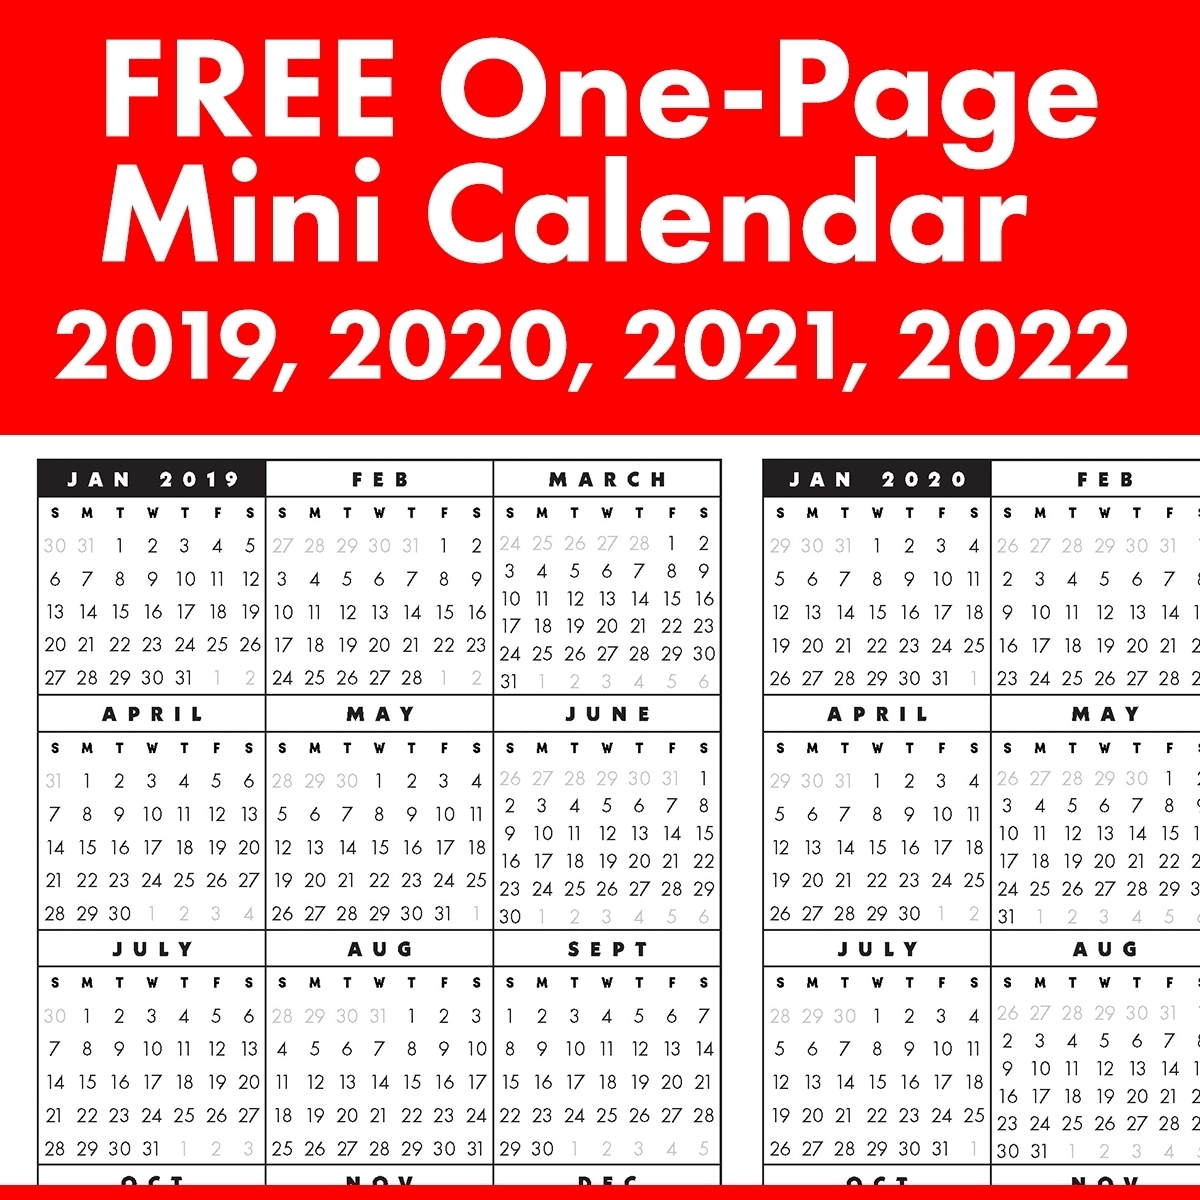 Stephen F Austin 2020-2021 Calendar - Calendar Inspiration inside Stephen F Austin Calendar 2019-2020